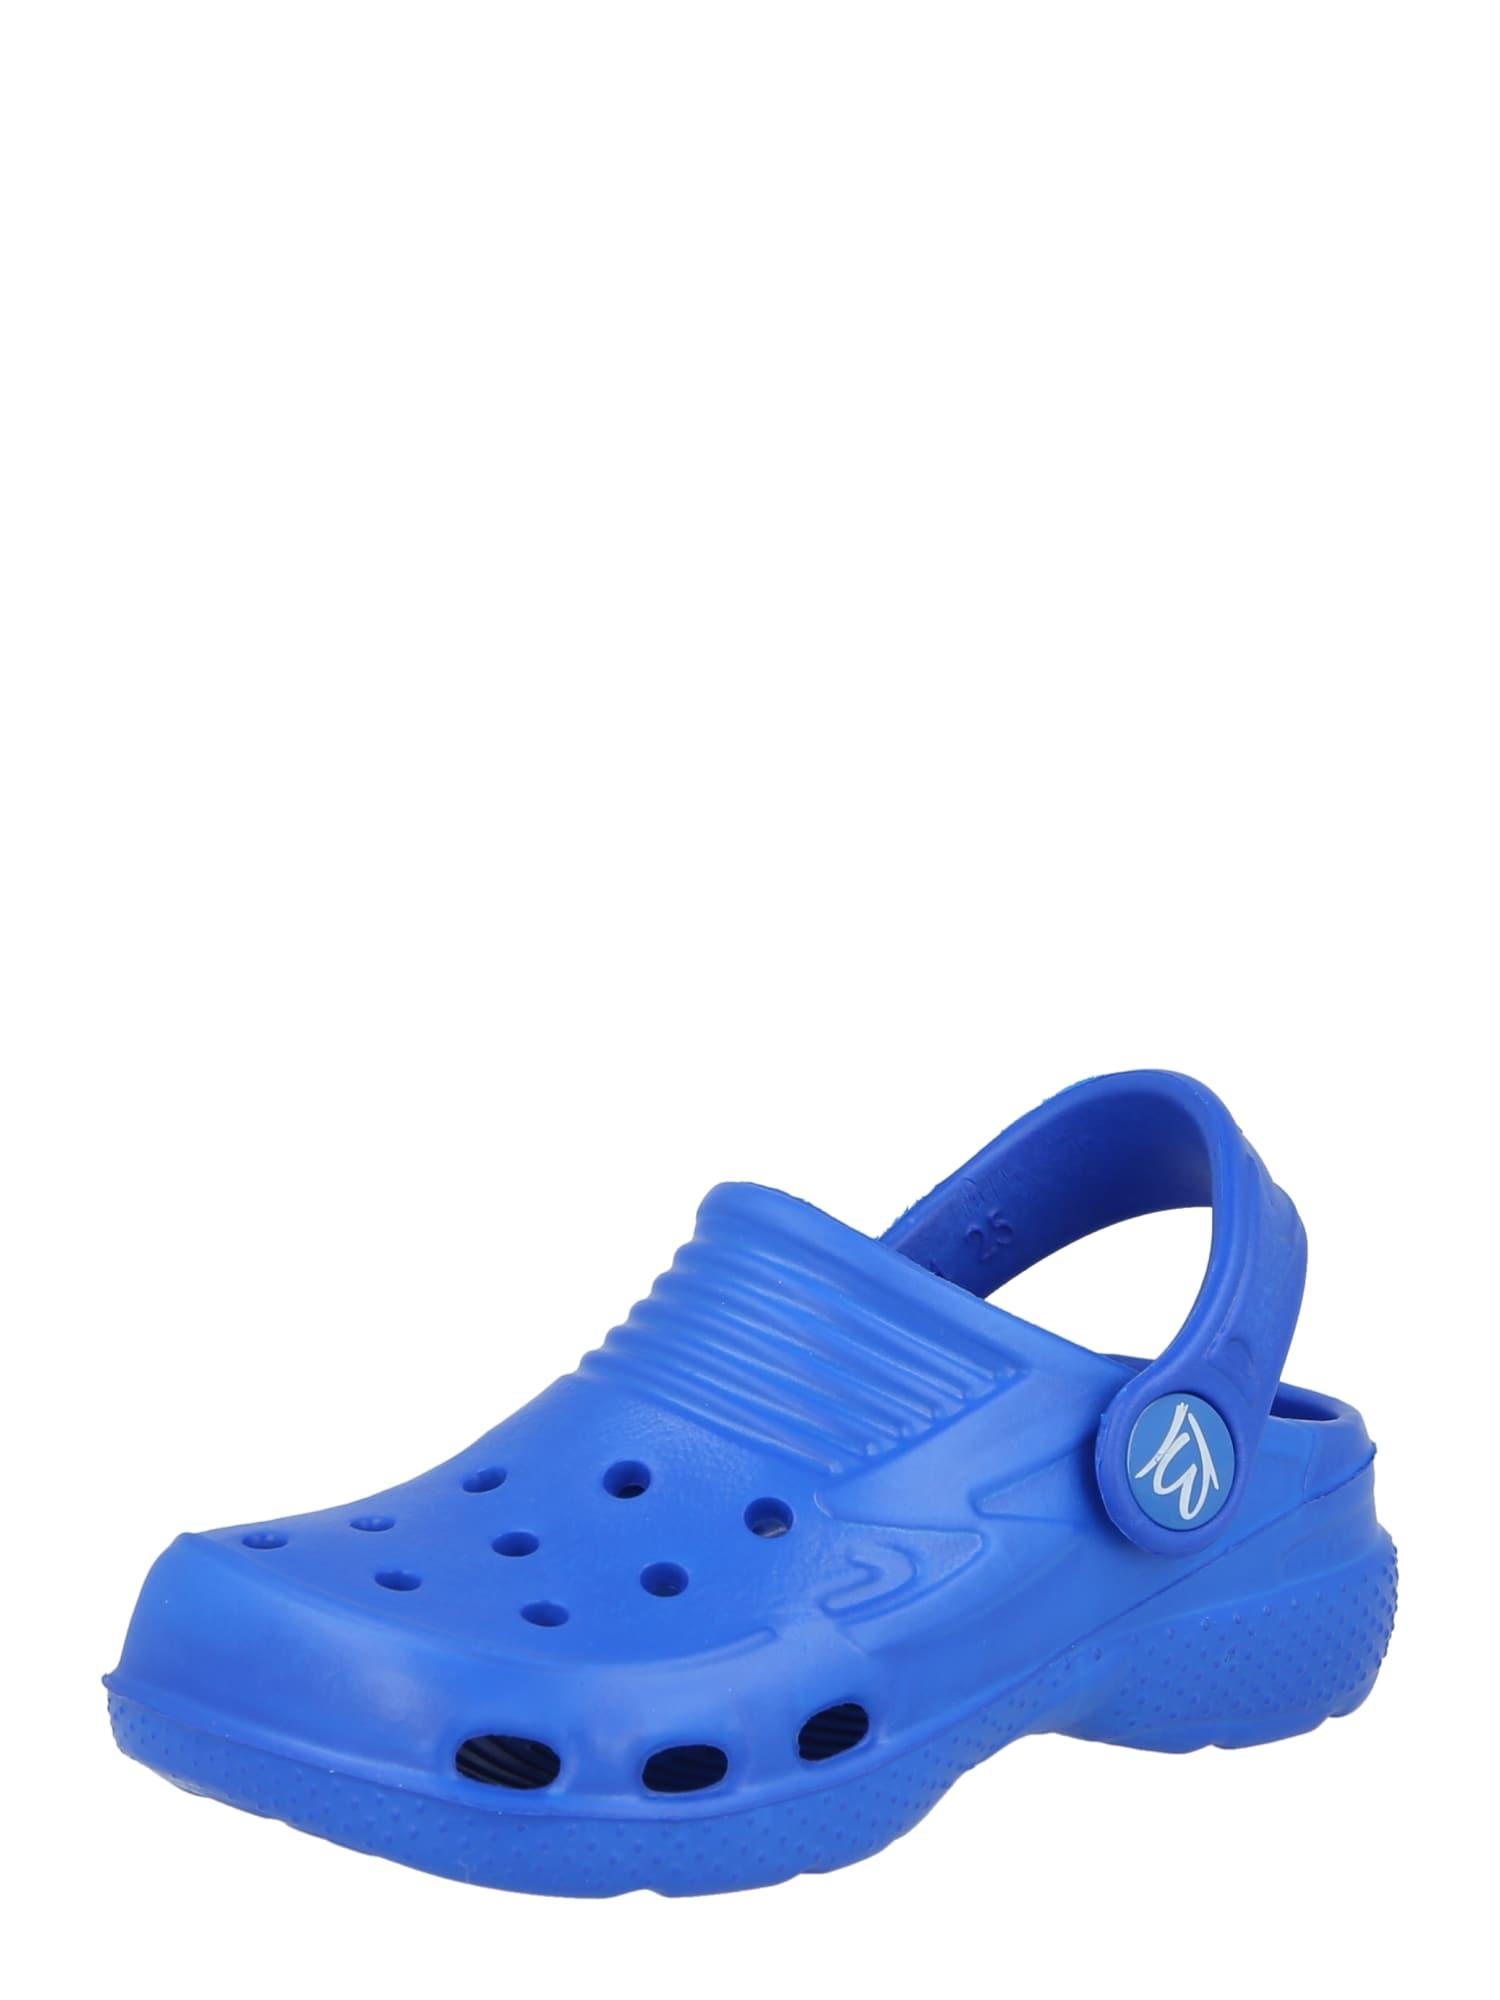 "BECK Atviri batai sodri mėlyna (""karališka"")"